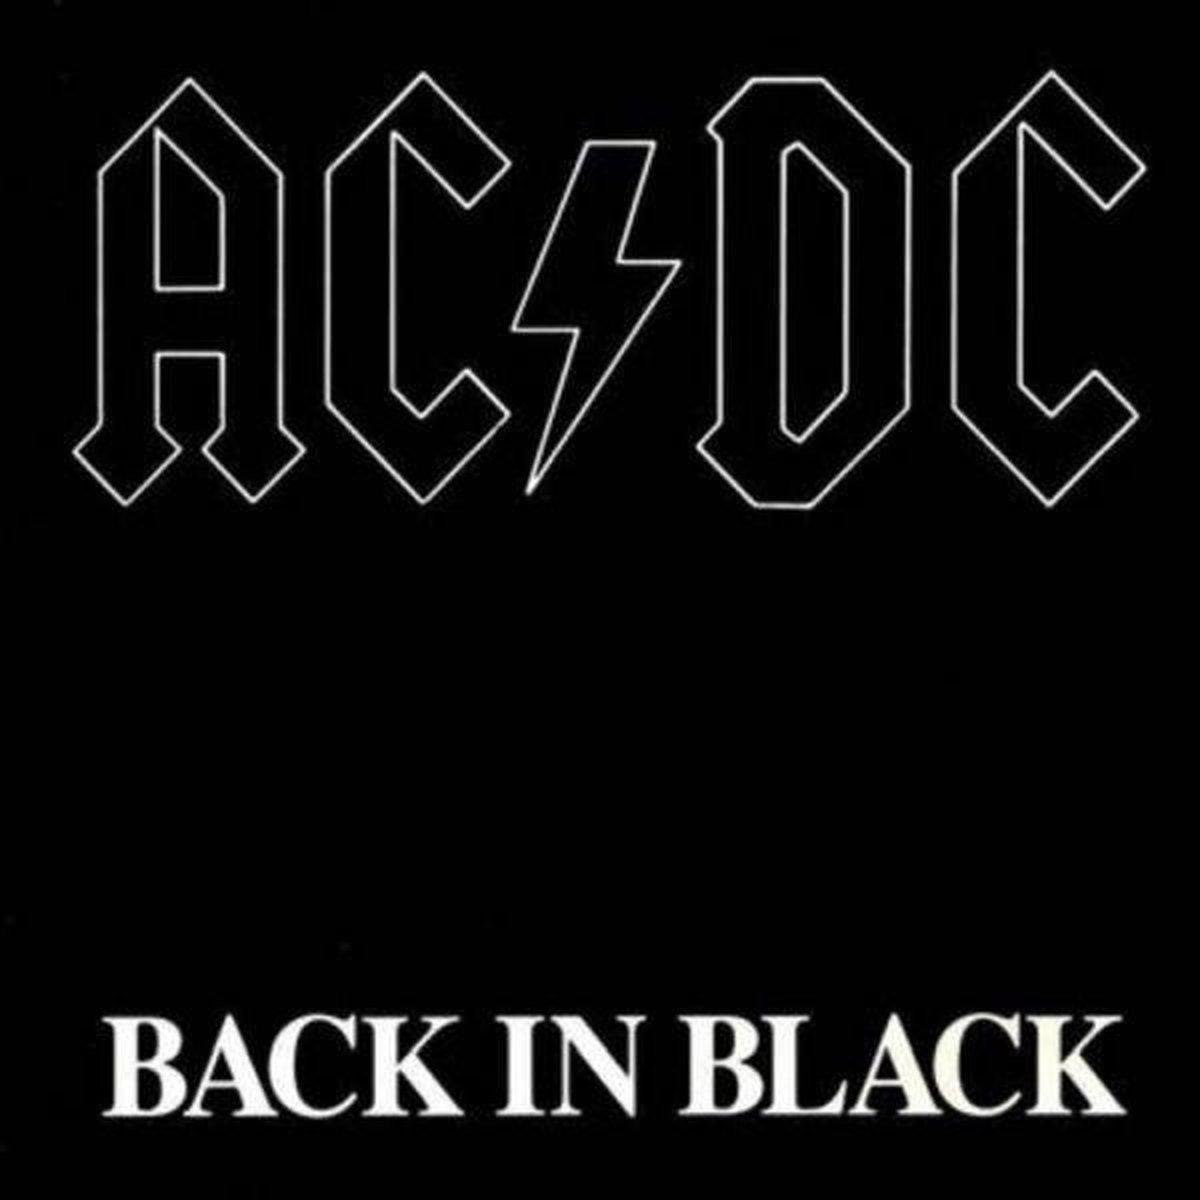 Back in Black (LP) - AC/DC